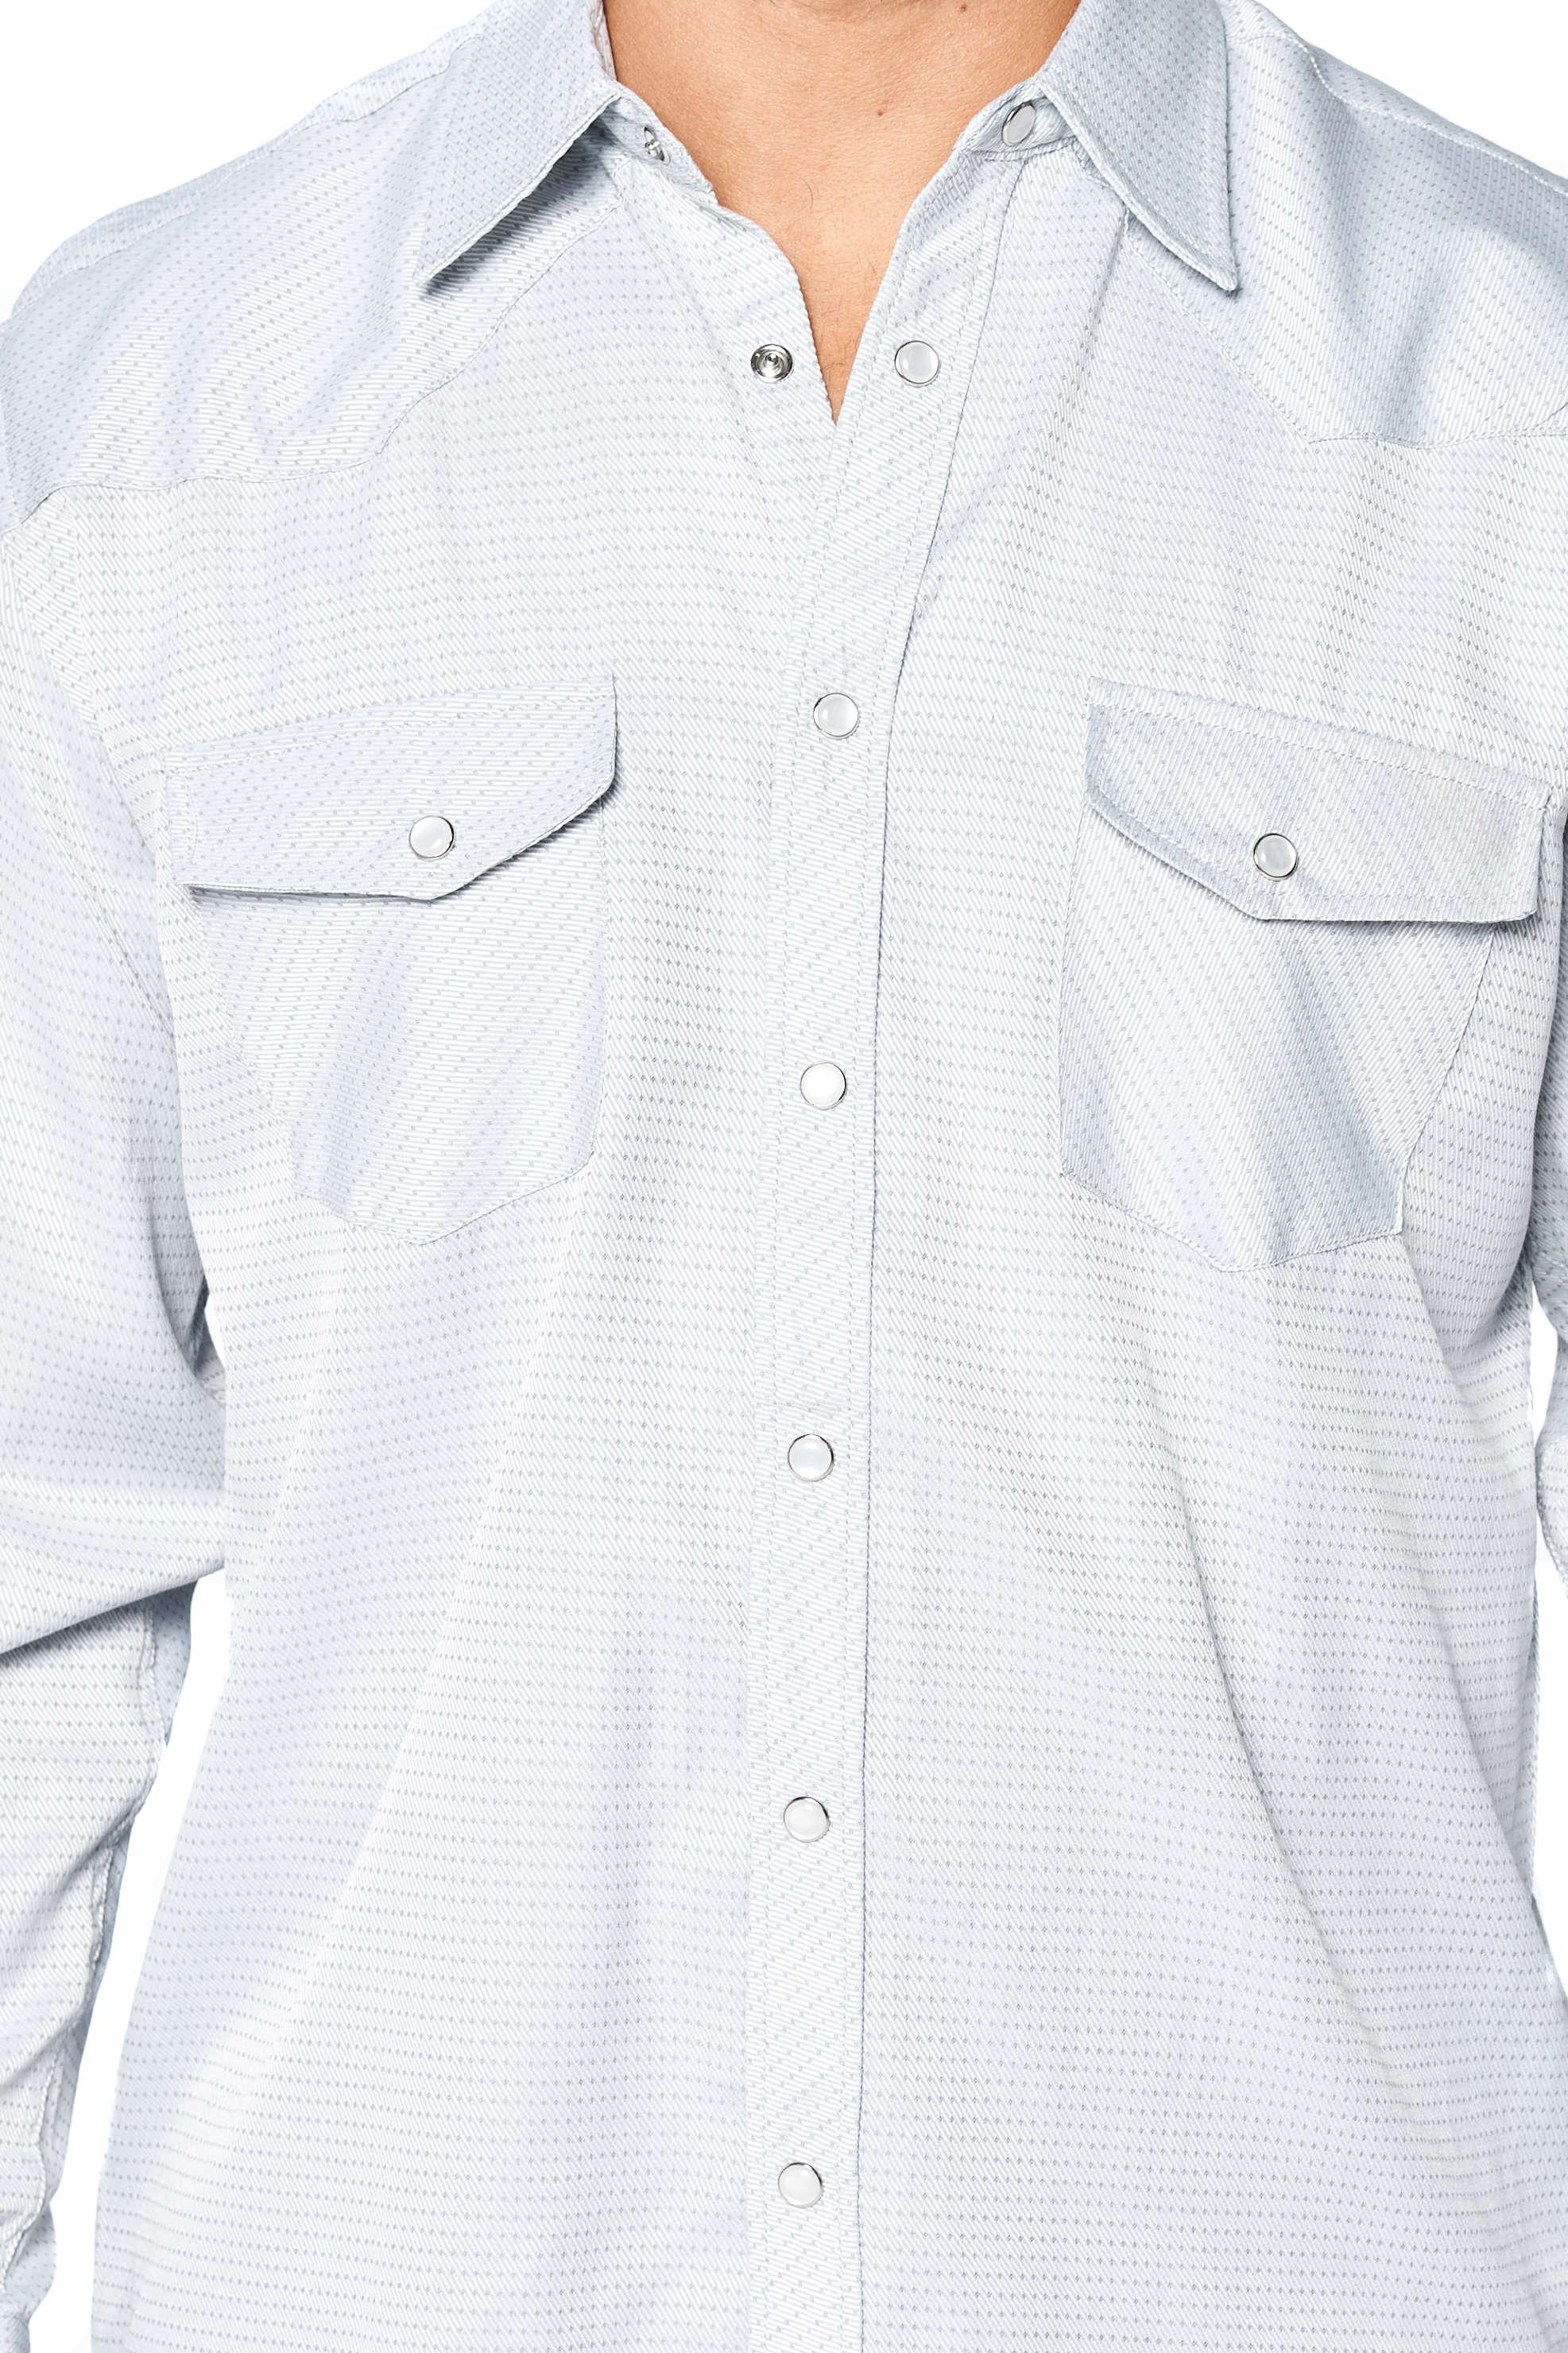 LW-Men-039-s-Pearl-Snap-Tribal-Stylish-Printed-Woven-Western-Vaquero-Rodeo-Shirt thumbnail 44